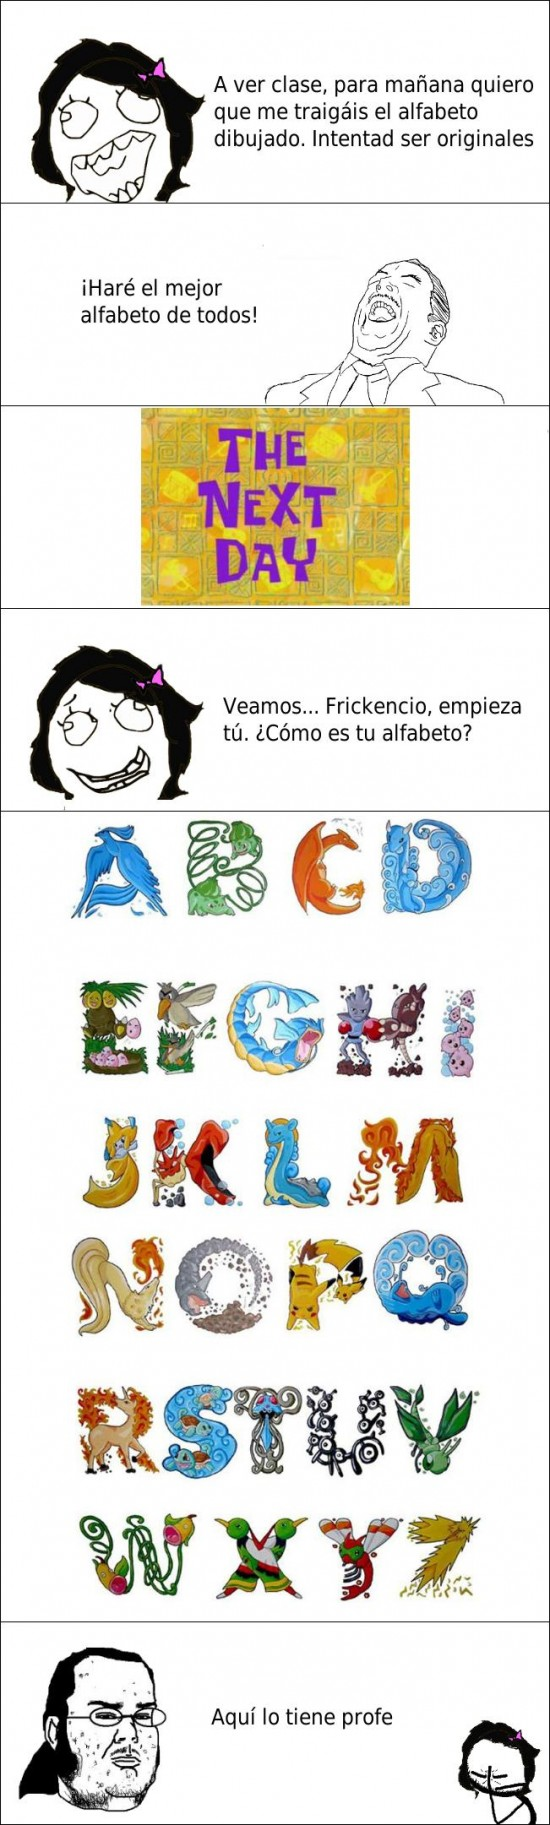 Friki - El alfabeto